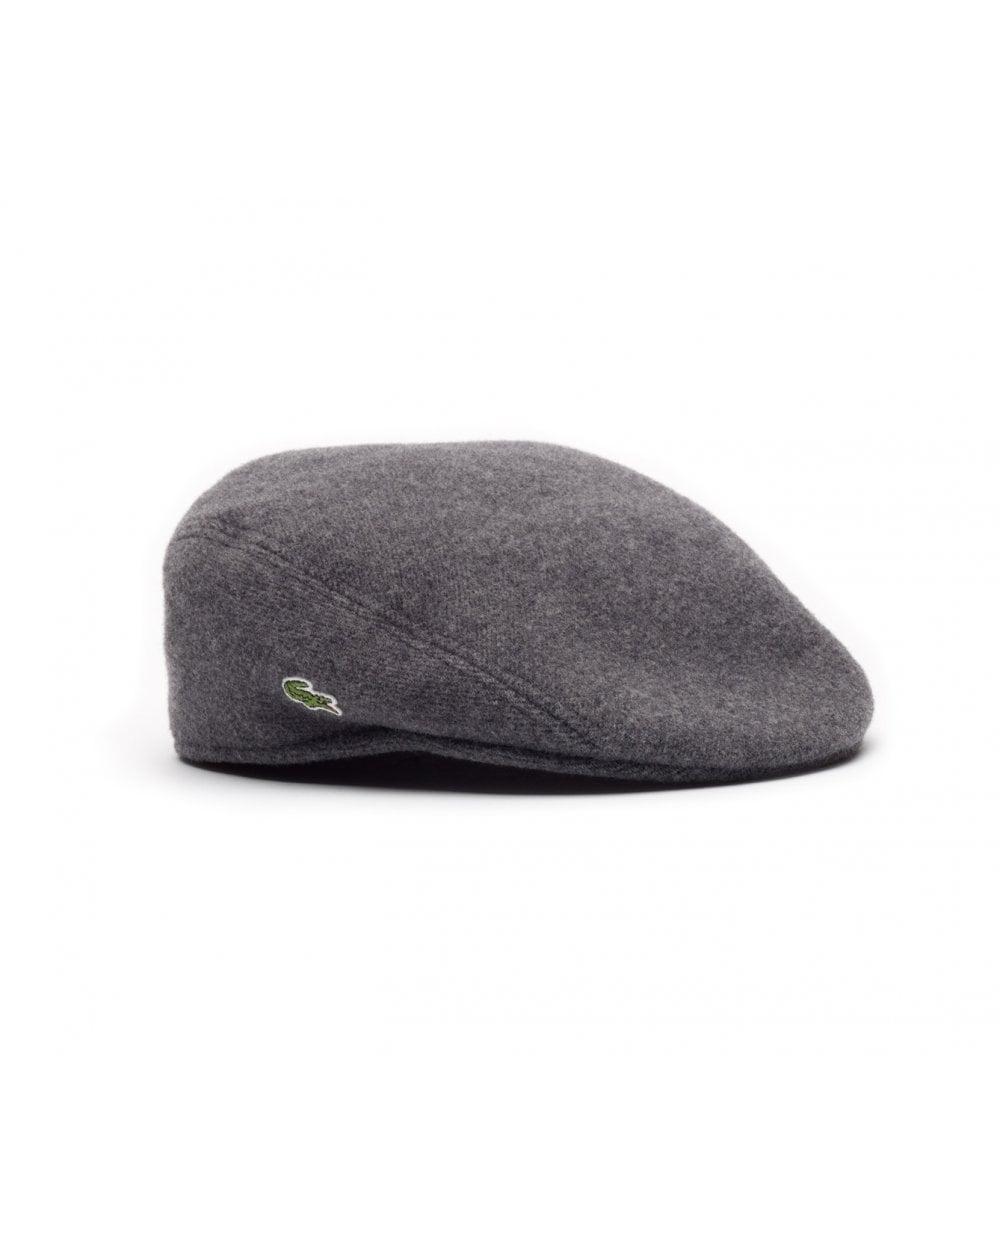 7878359cc4d27 Lacoste Lacoste Wool Broadcloth Flat Cap Stone Grey